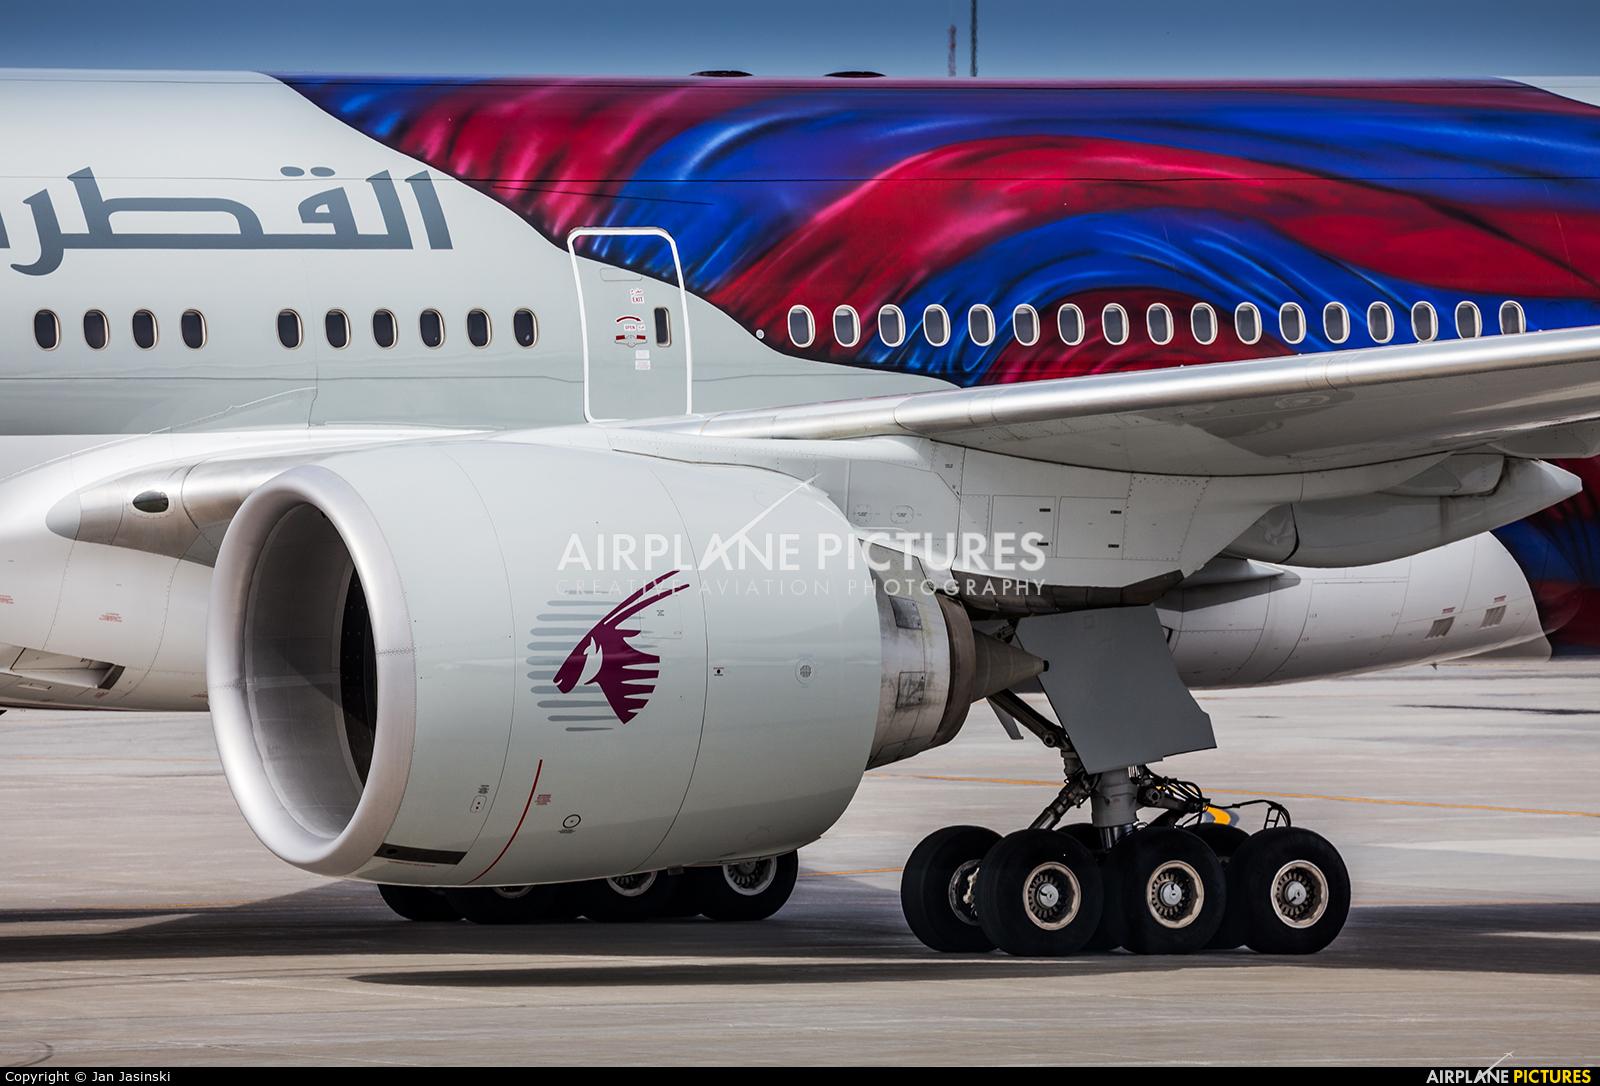 Qatar Airways A7-BAE aircraft at Montreal - Pierre Elliott Trudeau Intl, QC